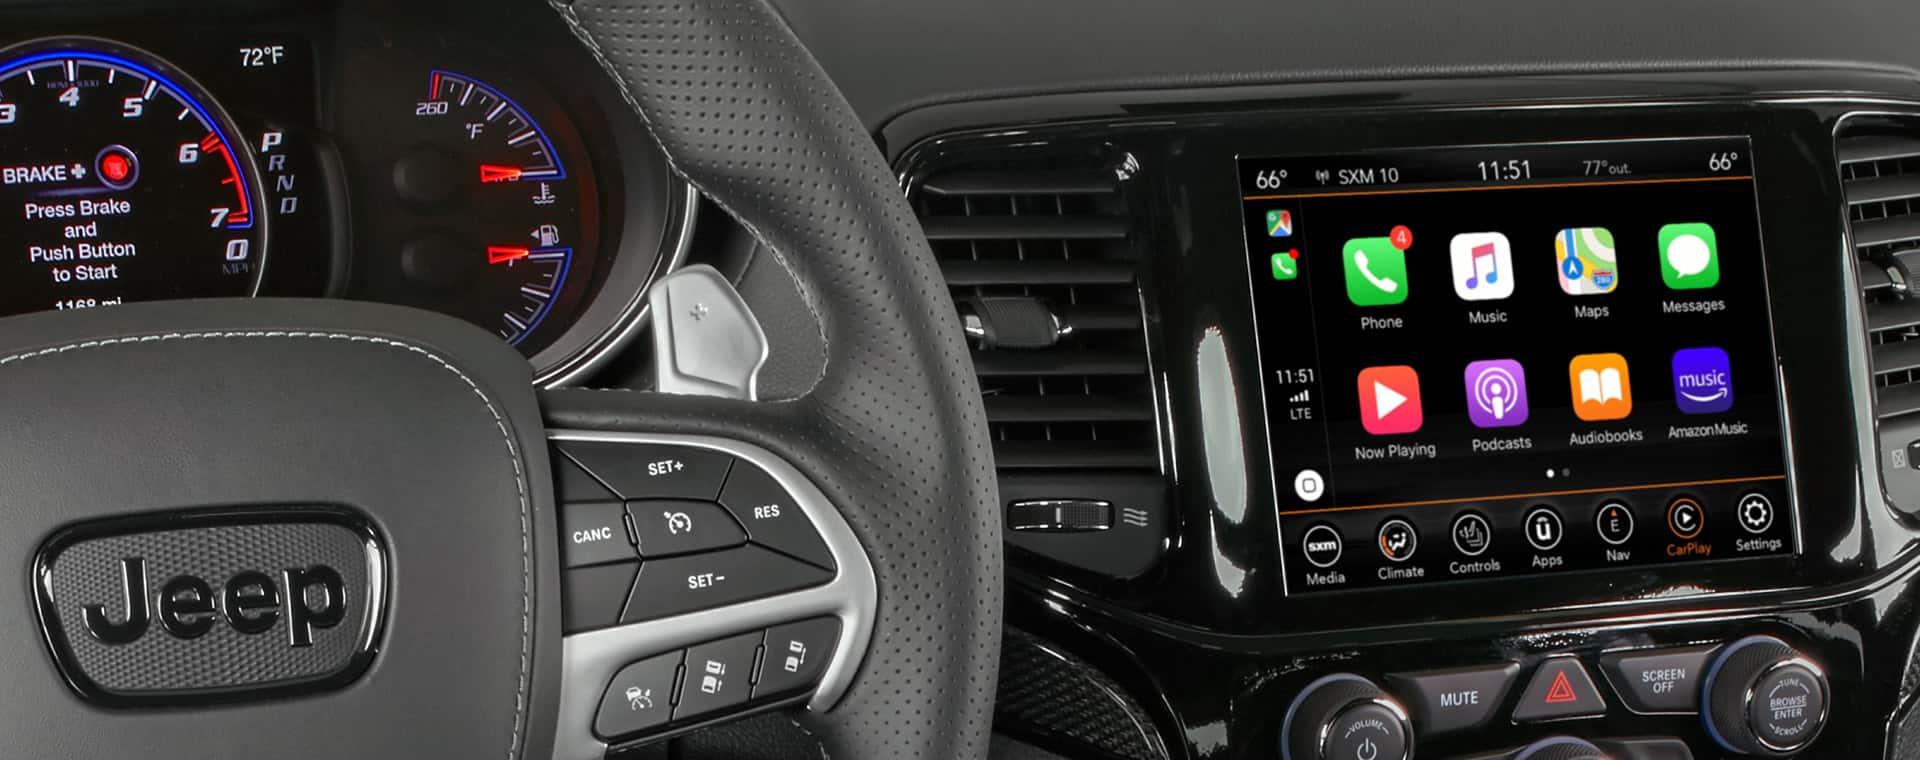 Primer plano de la pantalla táctil mostrandoApple Carplay.